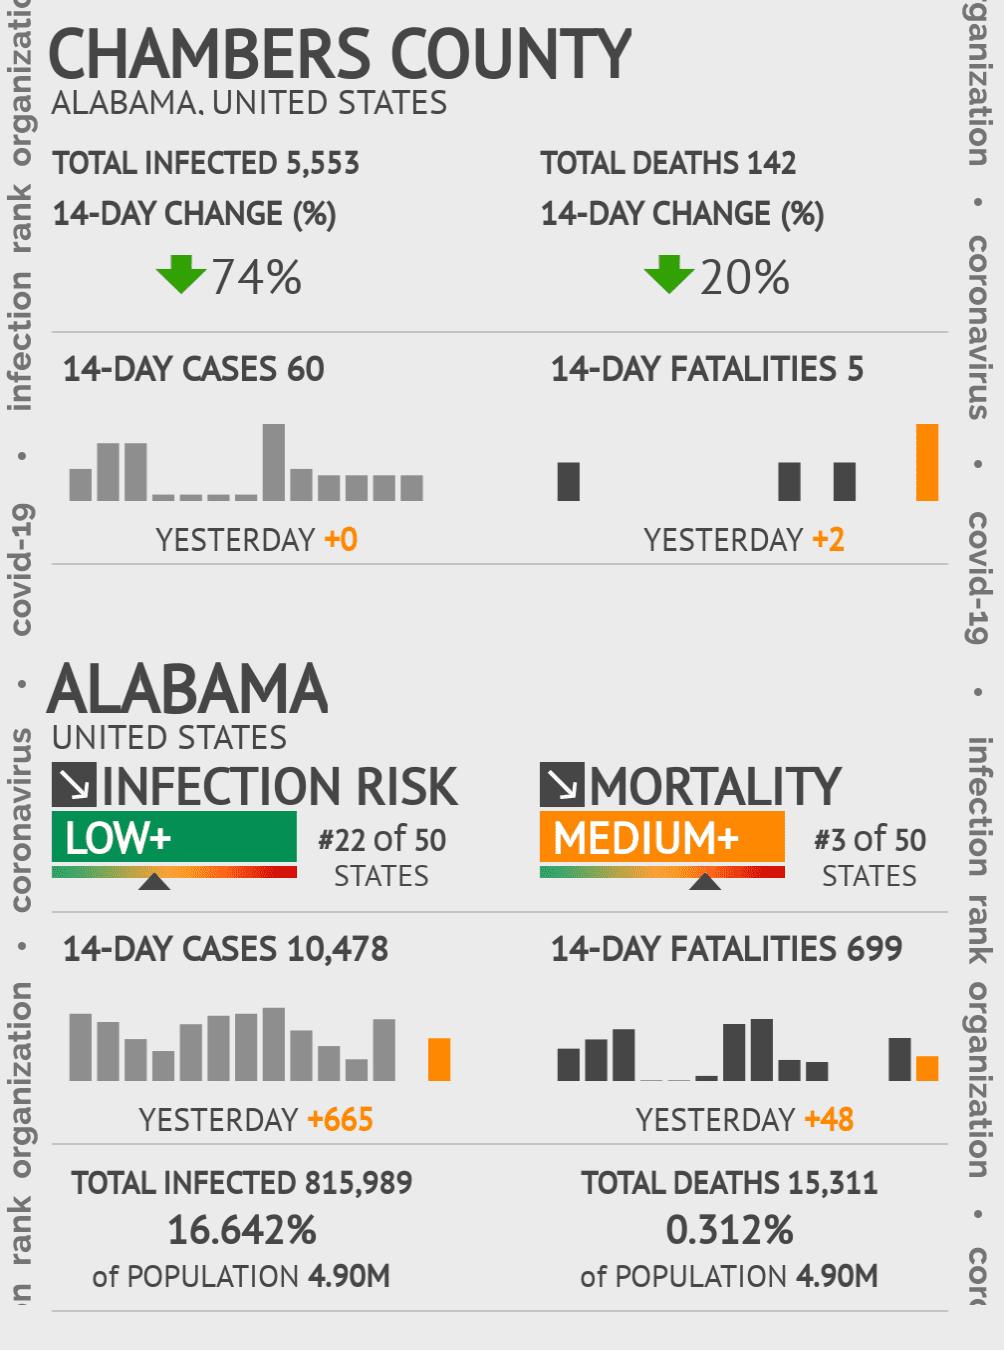 Chambers County Coronavirus Covid-19 Risk of Infection on February 26, 2021